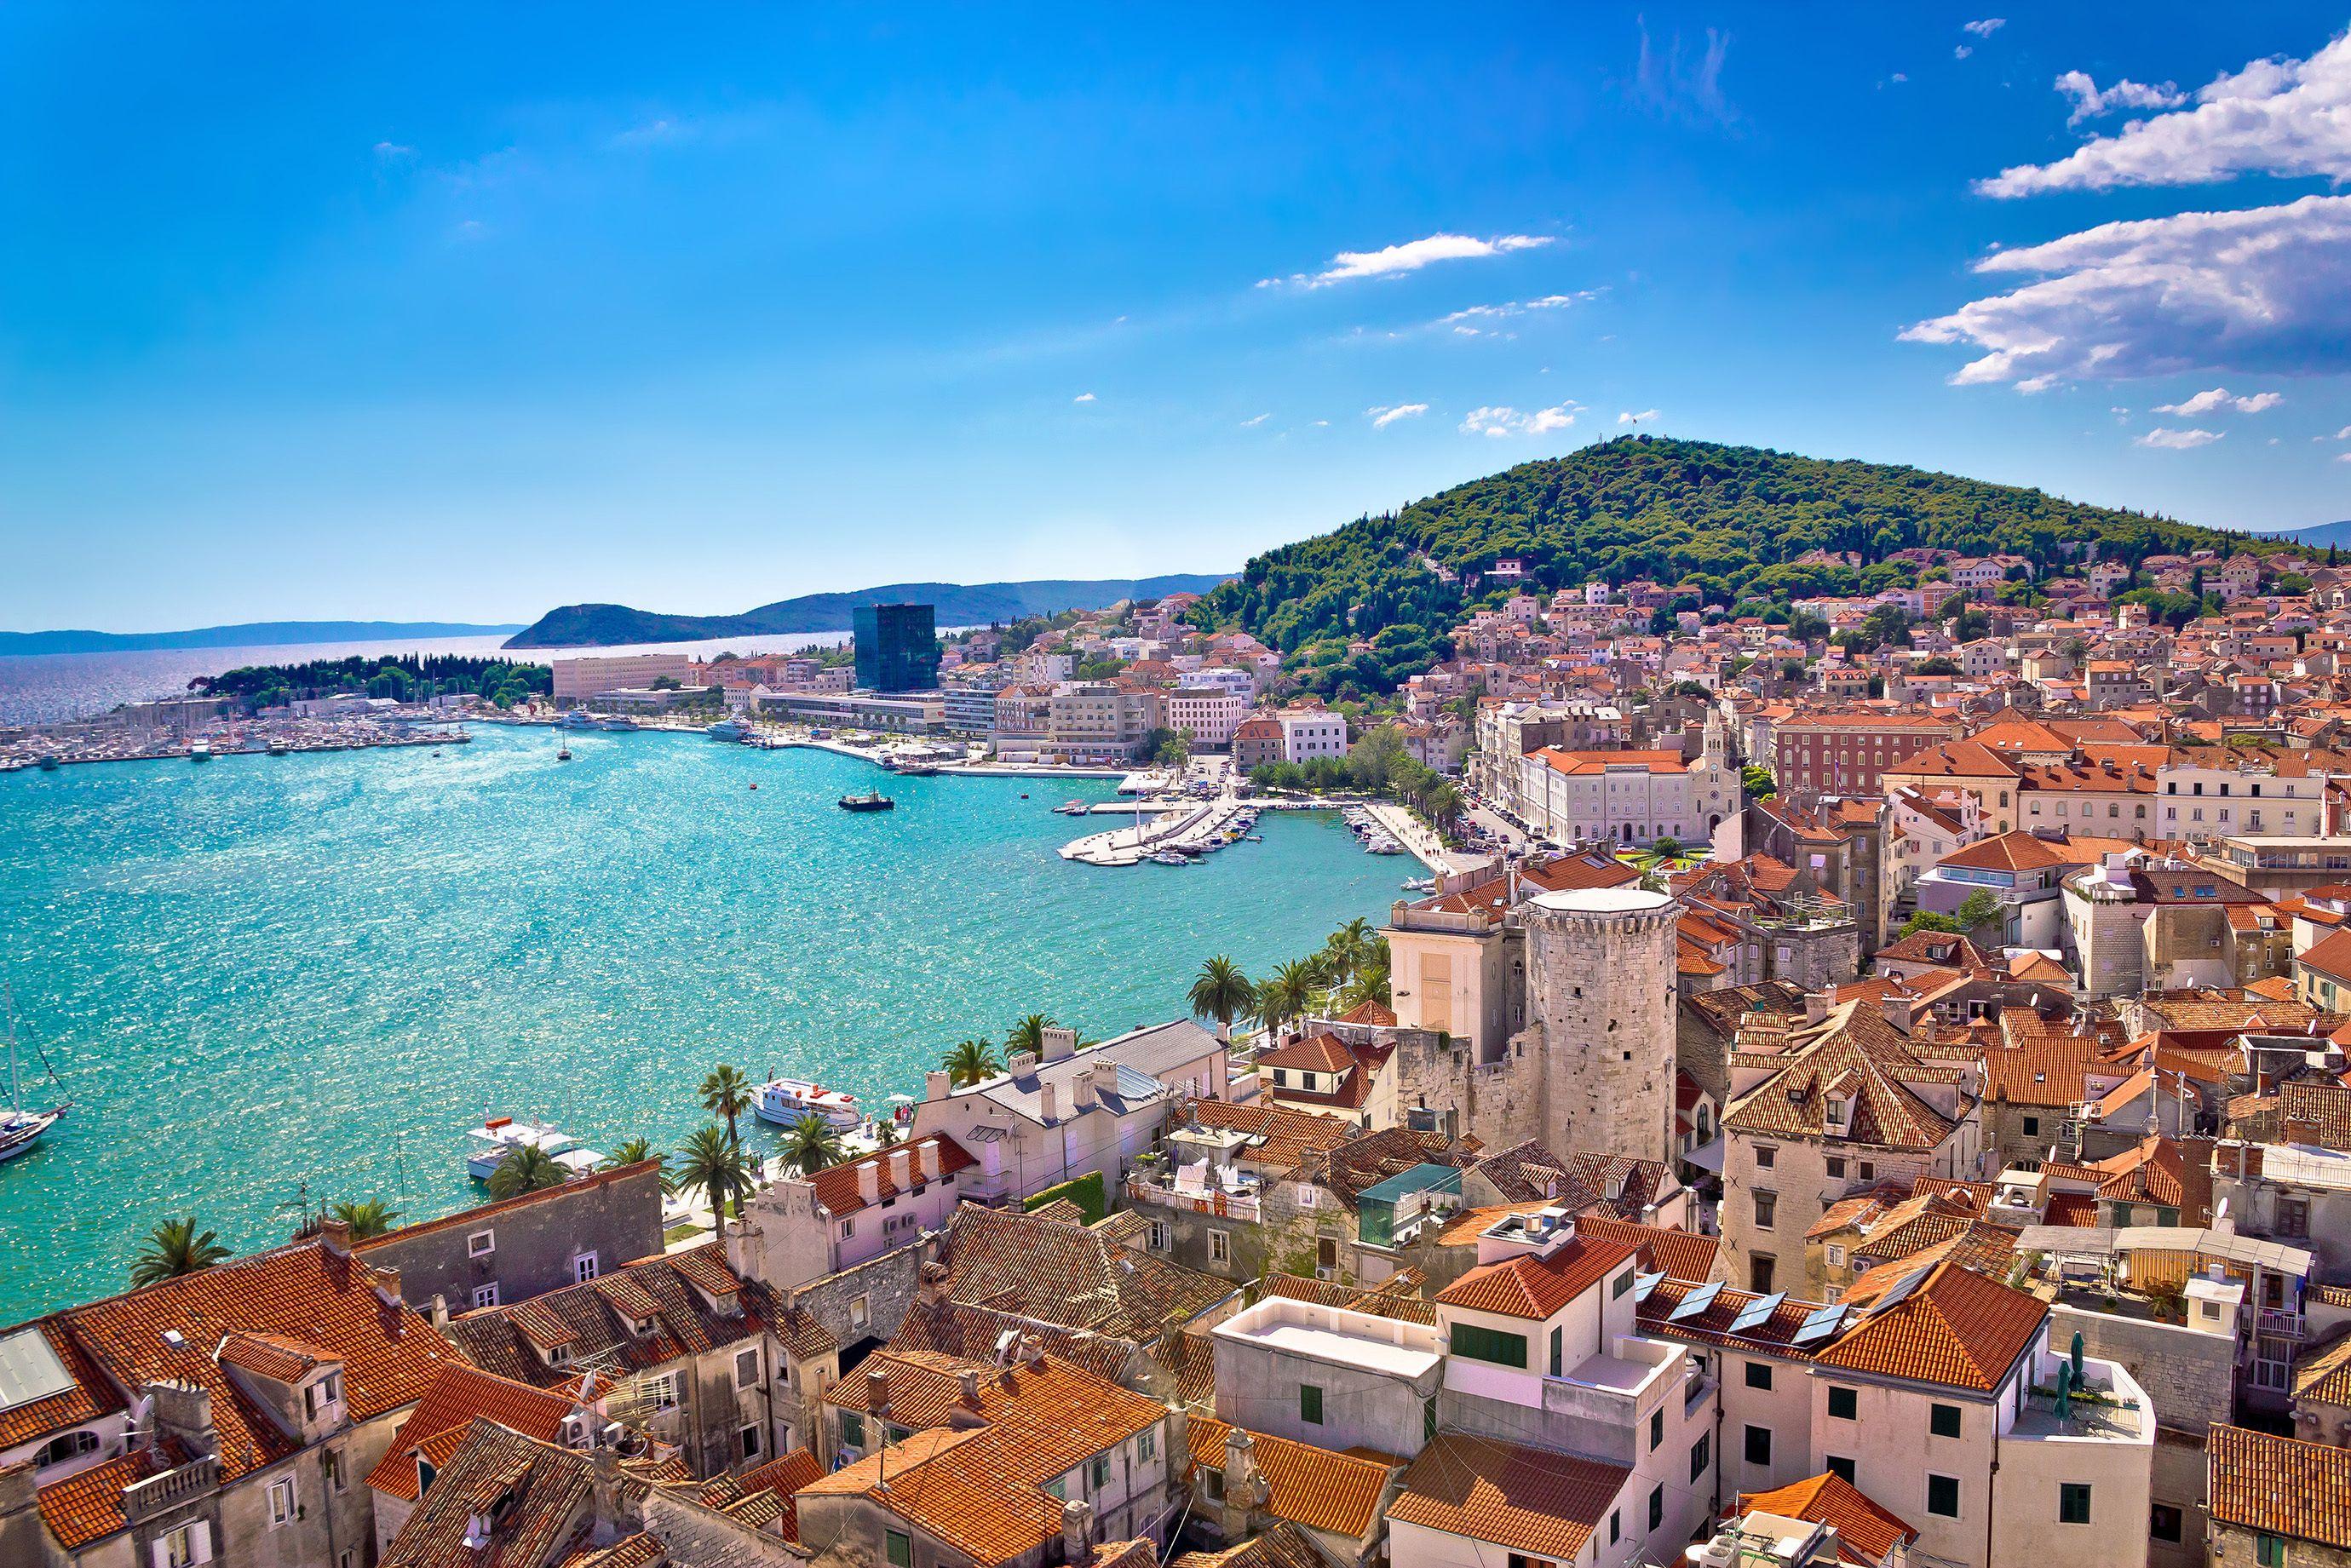 10 Breathtakingly Beautiful Beach Cities In Europe Europe Travel Croatia Travel Trip